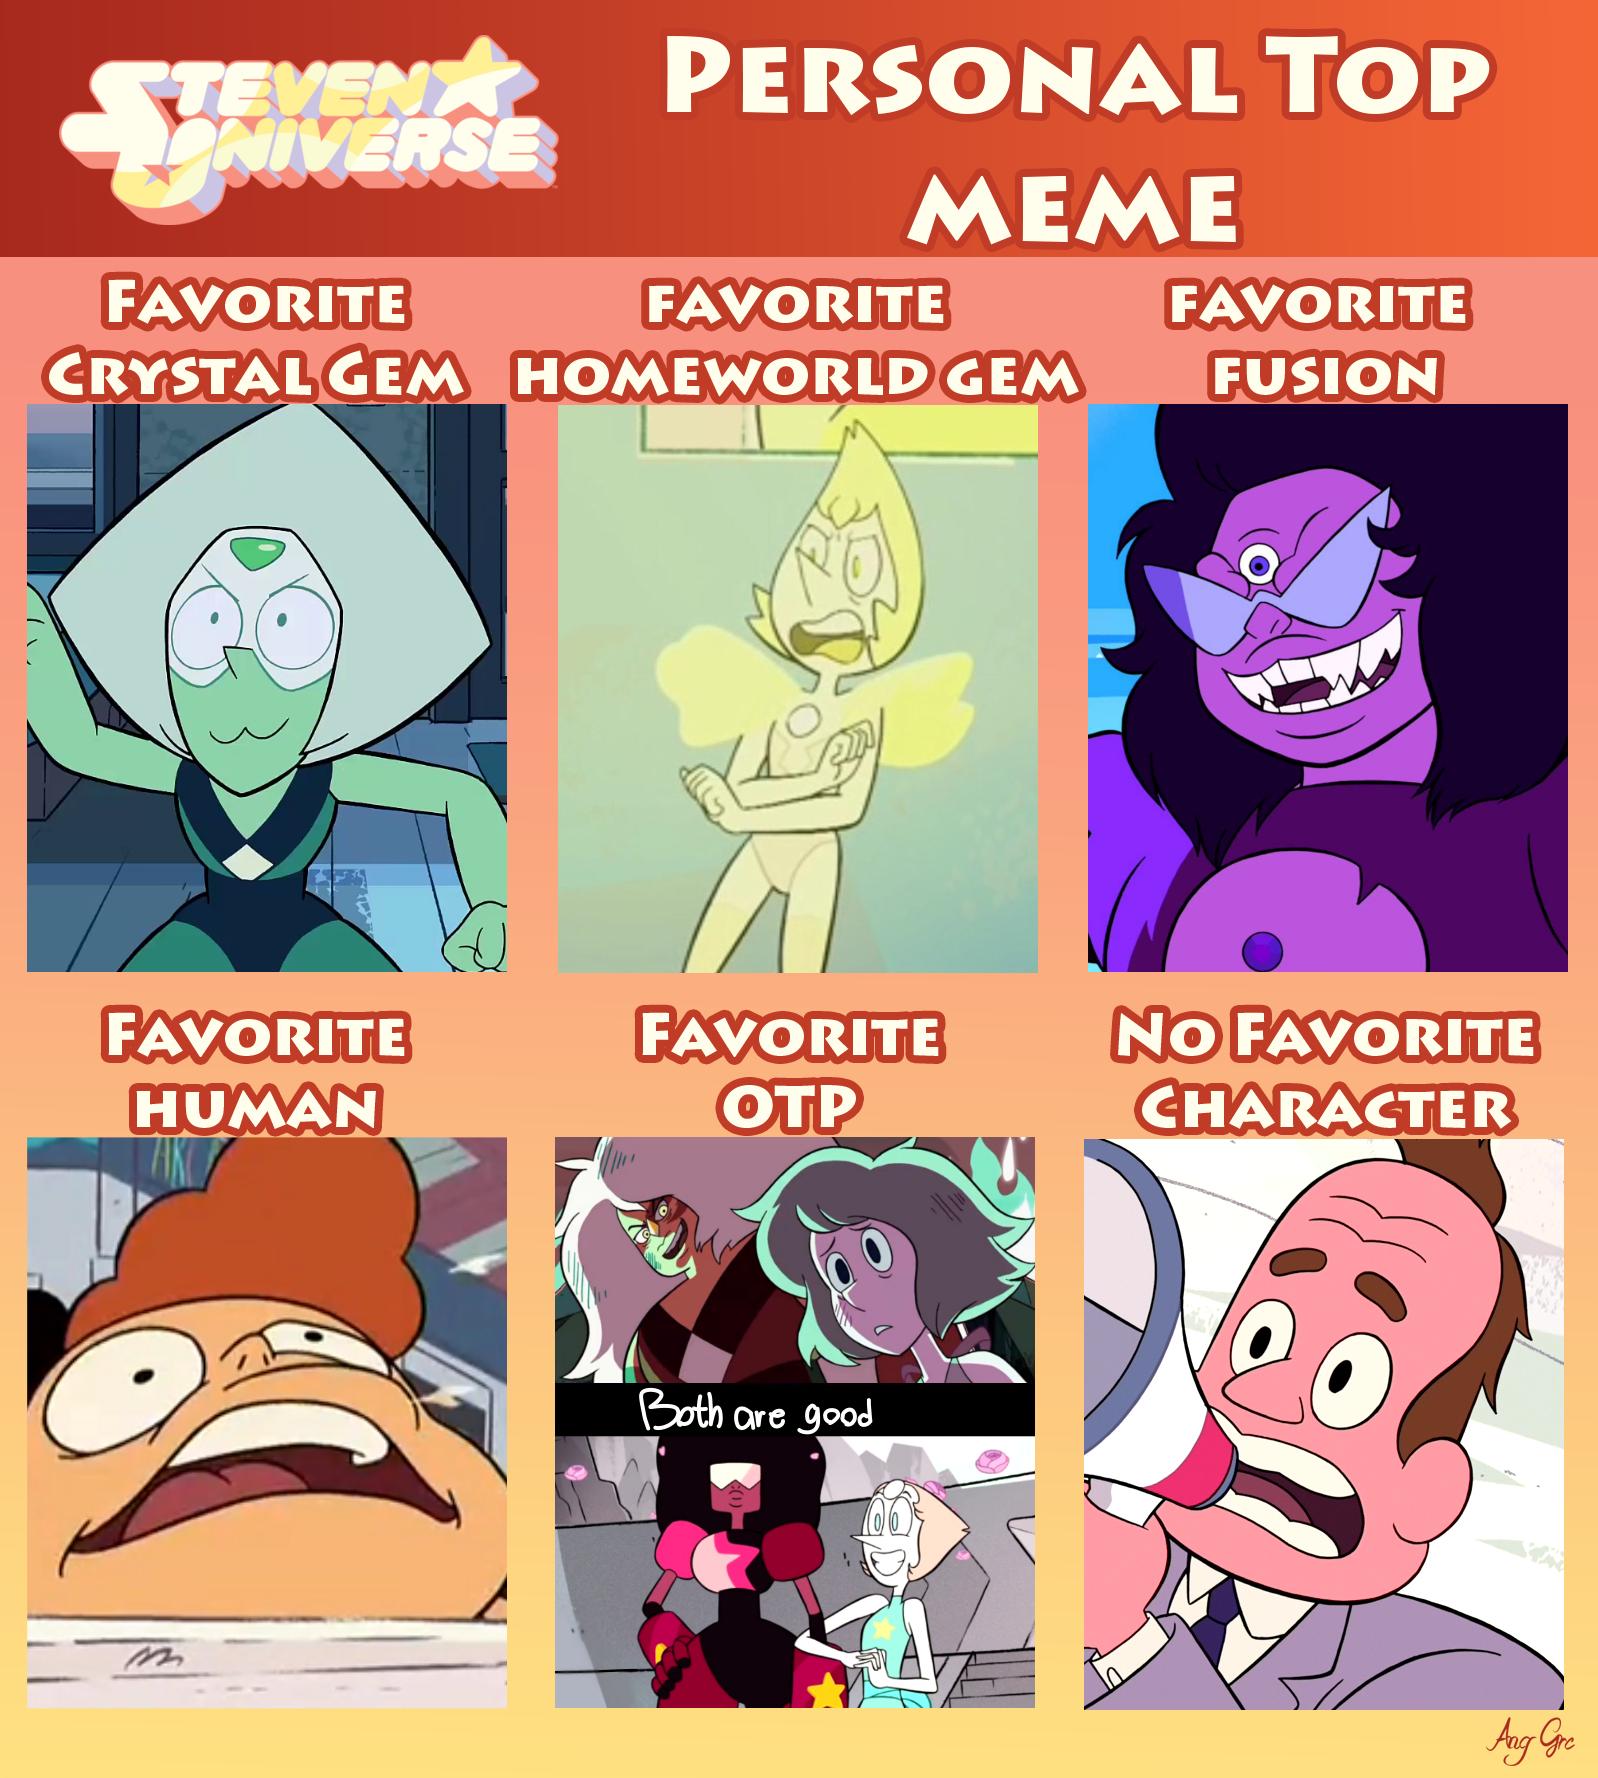 Steven universe Memes